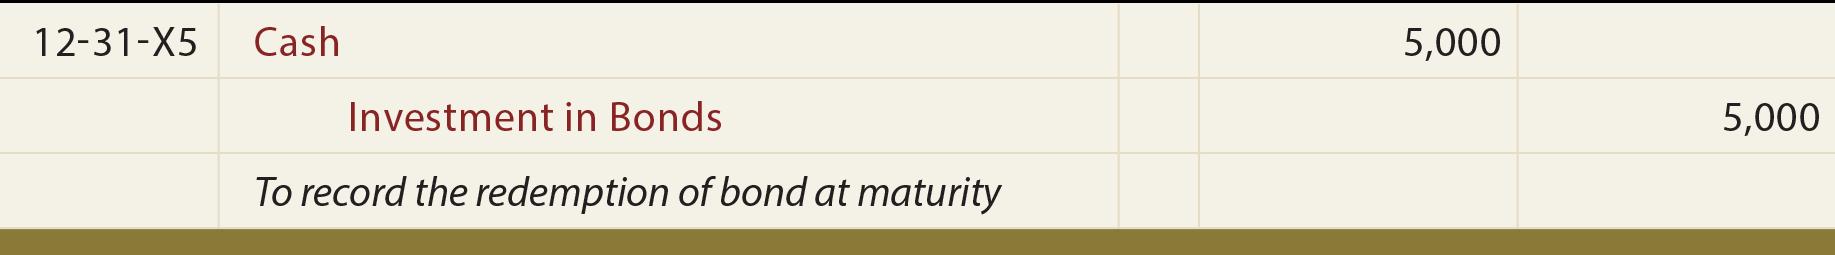 Bond Principal Repaid at Maturity Journal entry